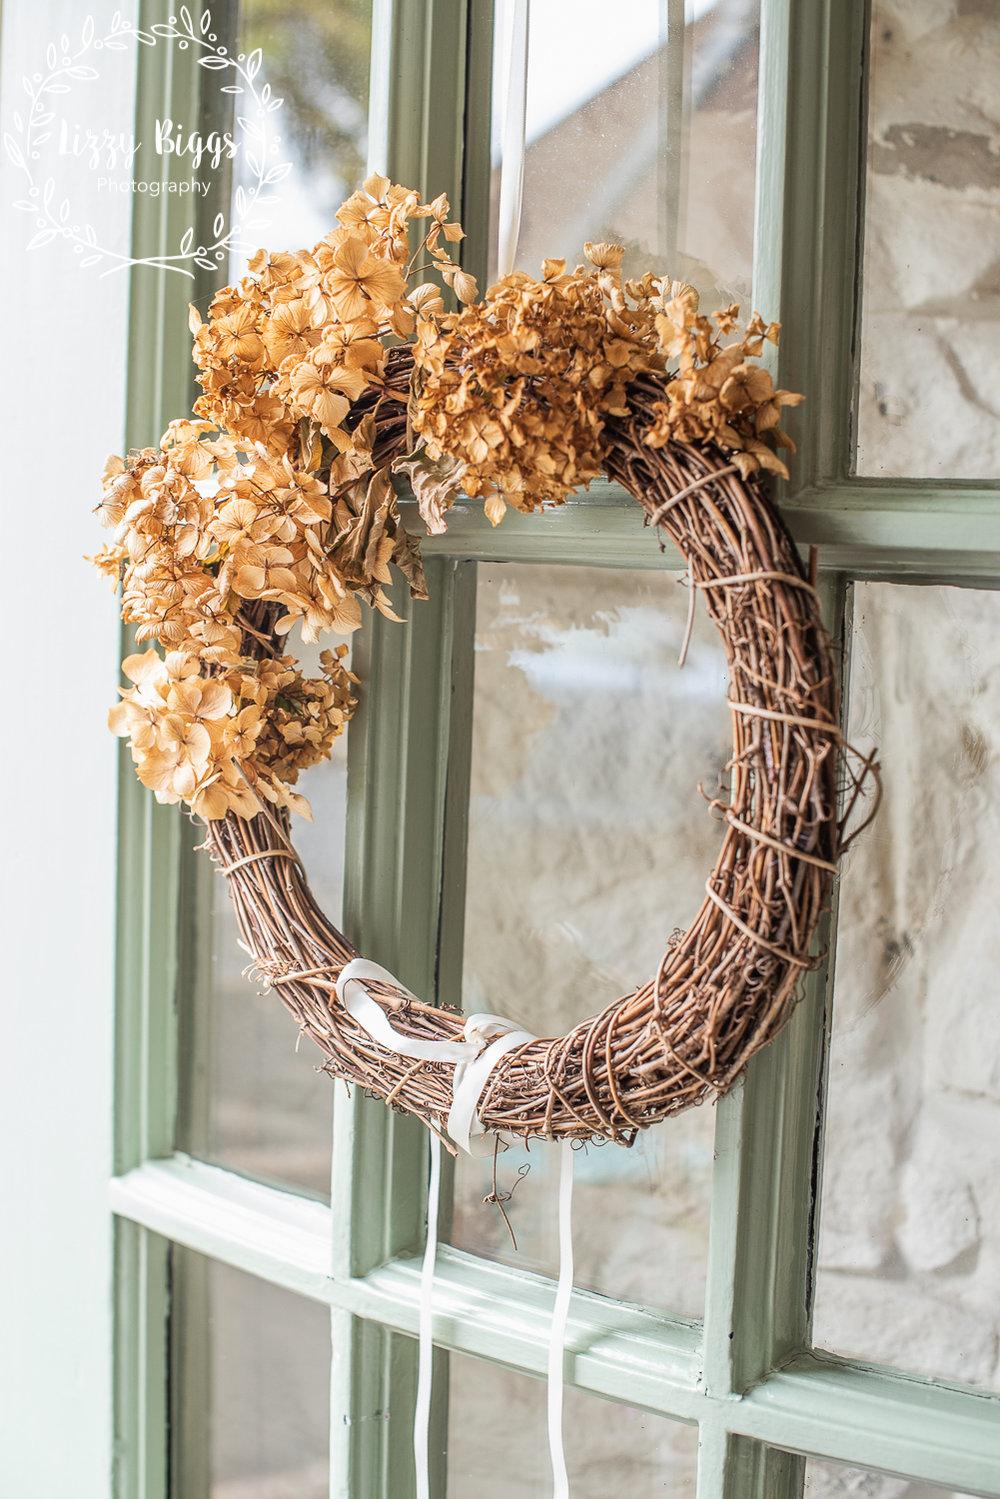 Lizzy_Biggs_Photography_dried_flowers_wreath_on_door